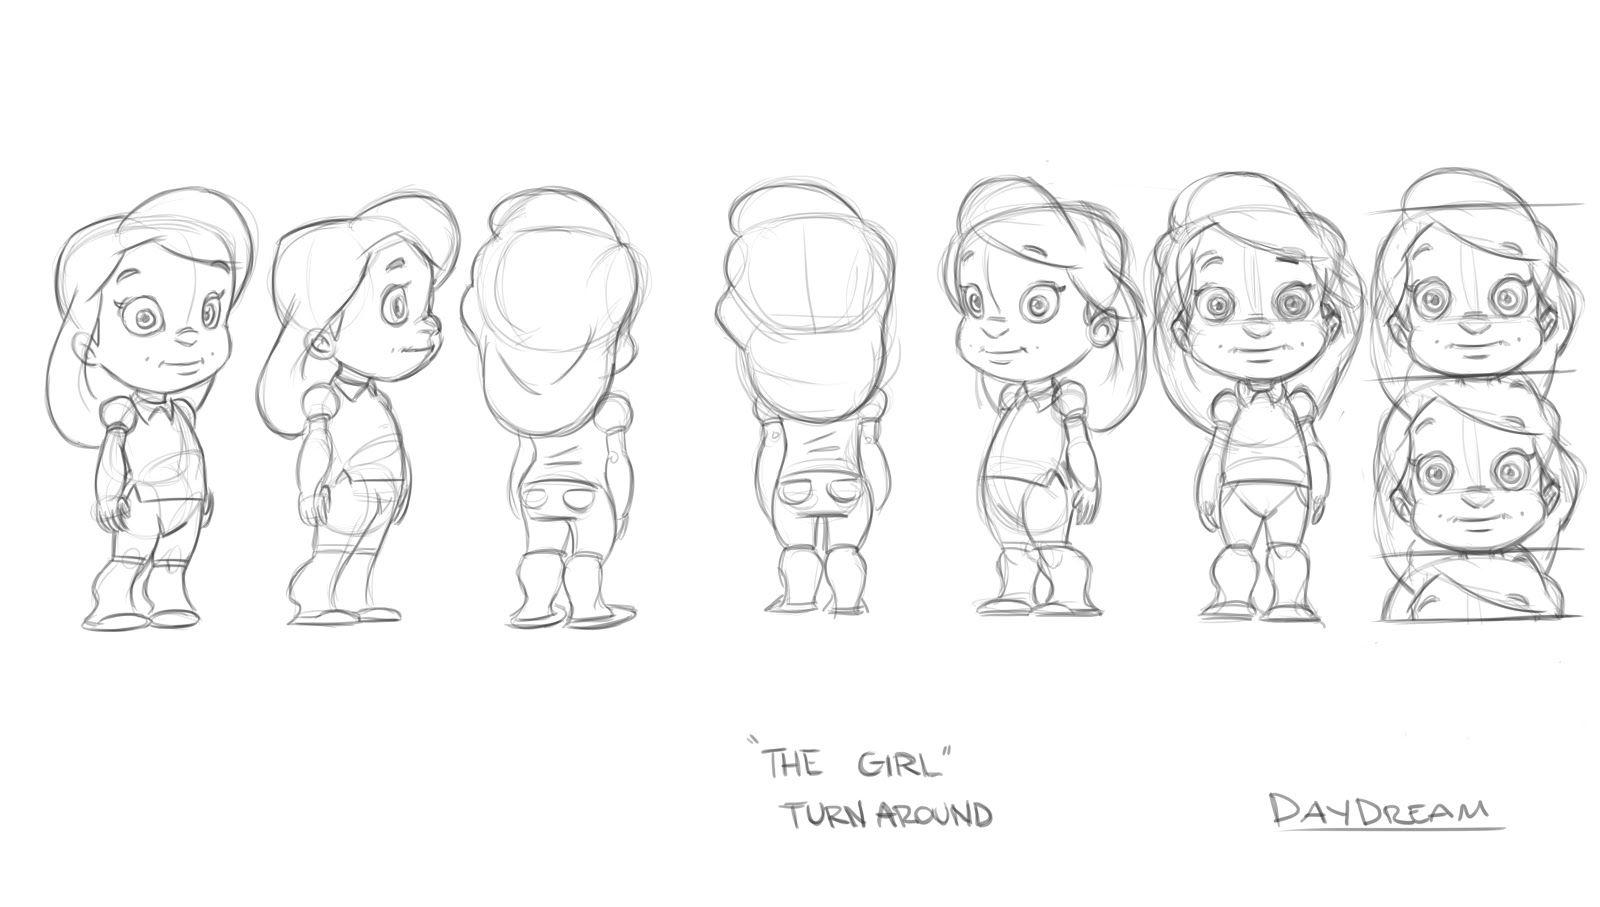 Character Design Sheet Template : Girl character design sheet pixshark images